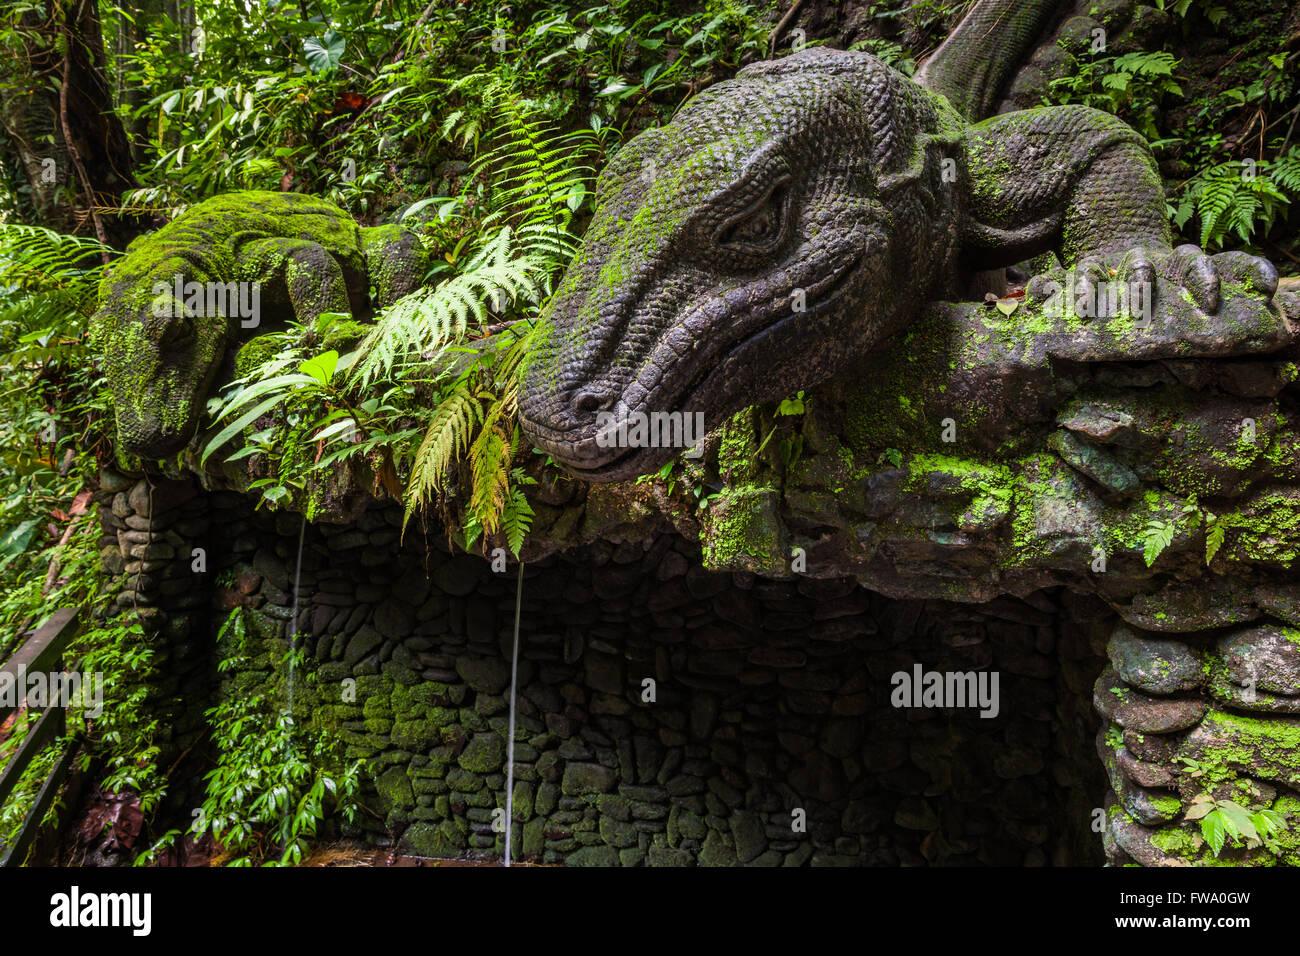 Giant Lizard in Sacred Monkey Forest Sanctuary, Ubud, Bali, Indonesia Stock Photo